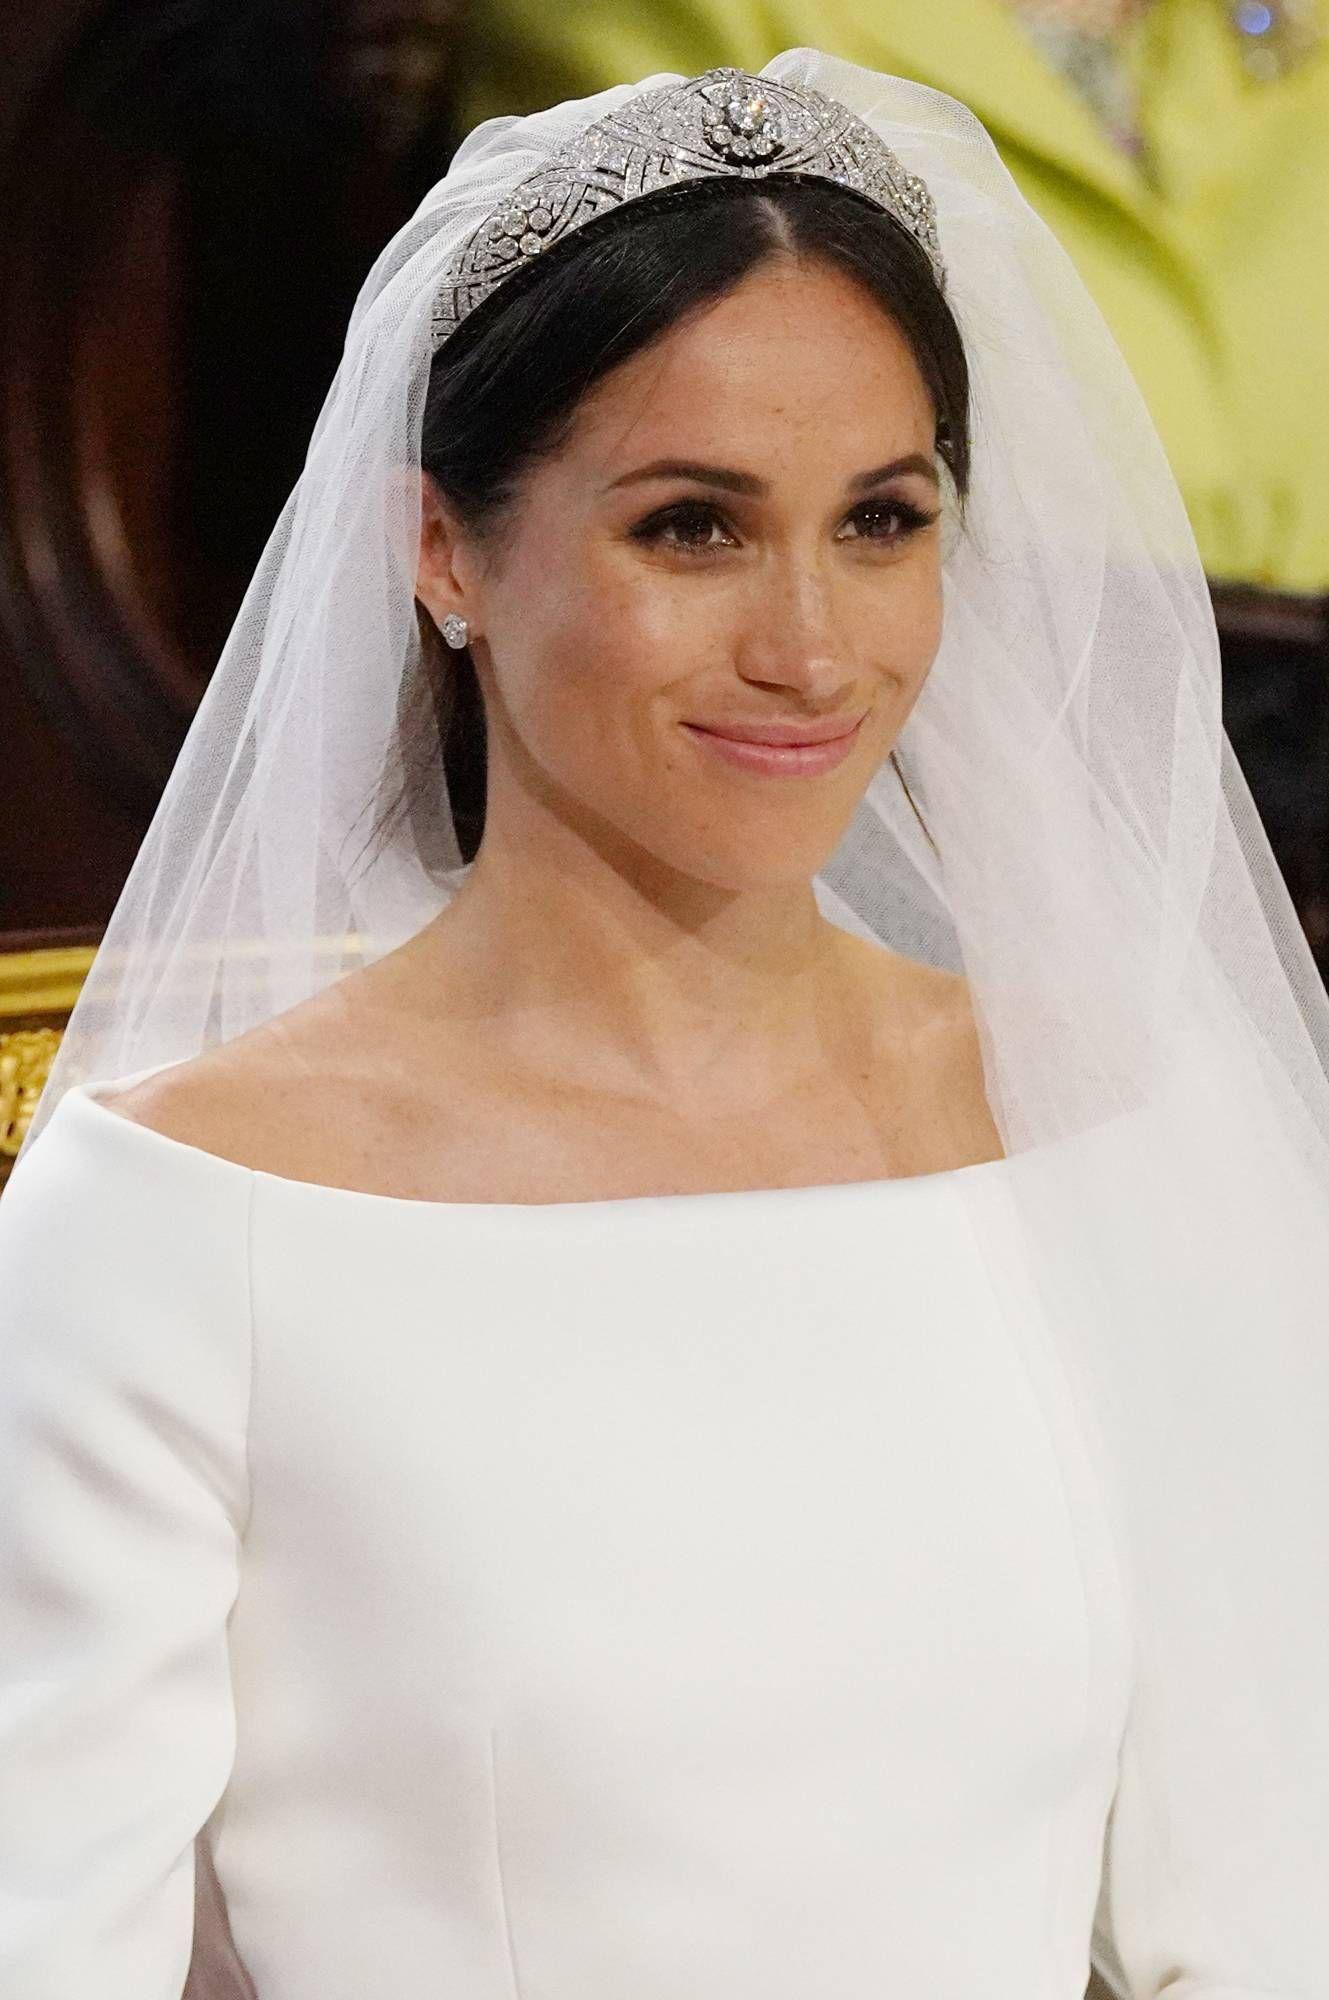 Meghan Markle\'s Royal Wedding Dress Is a Nod to American Royalty ...